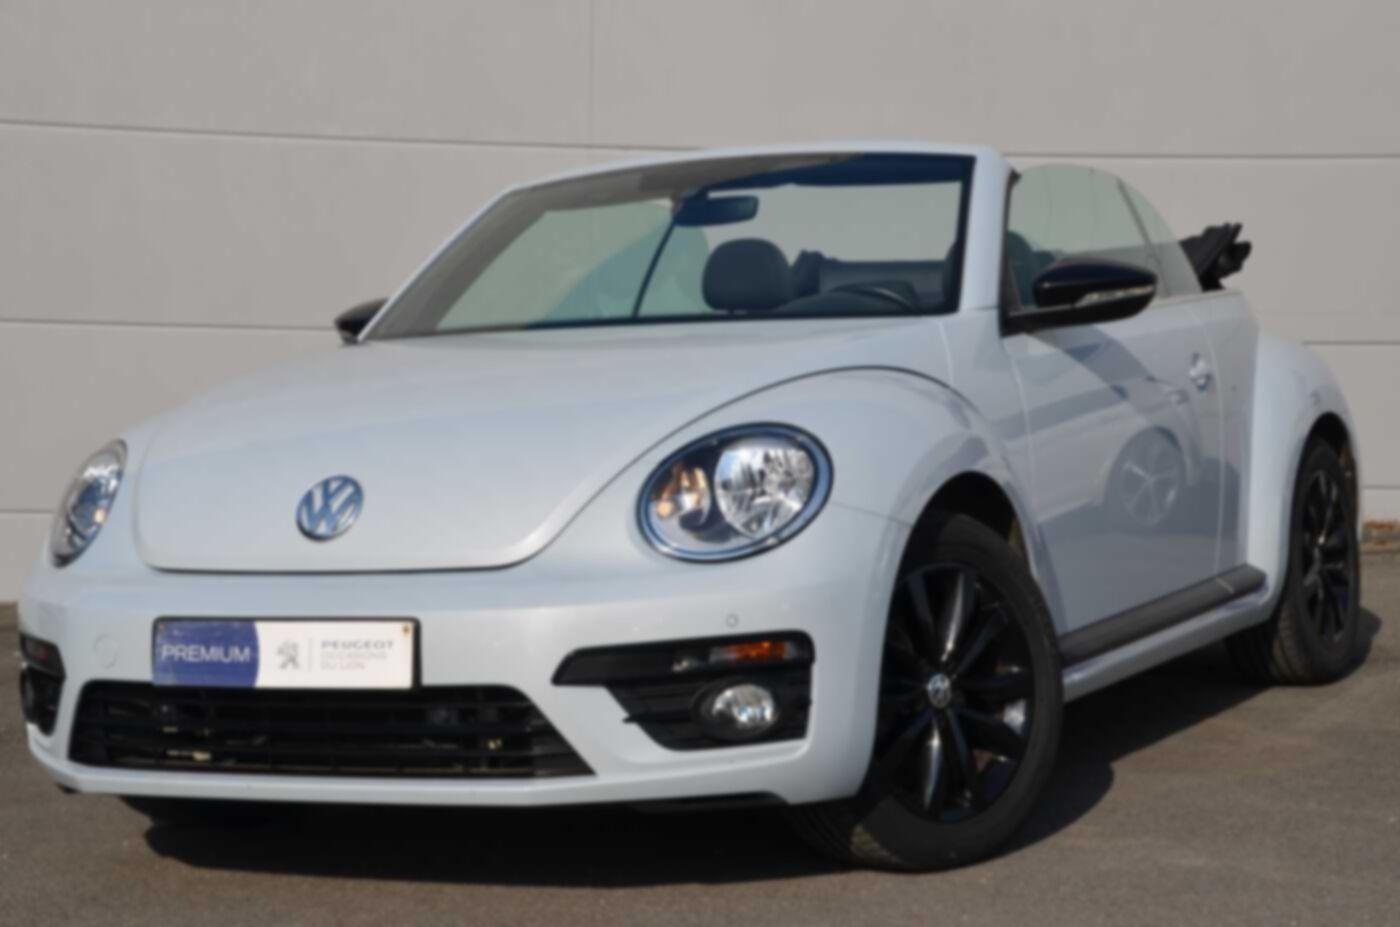 Volkswagen Beetle Mark 2 (2011) 1.2 TSI